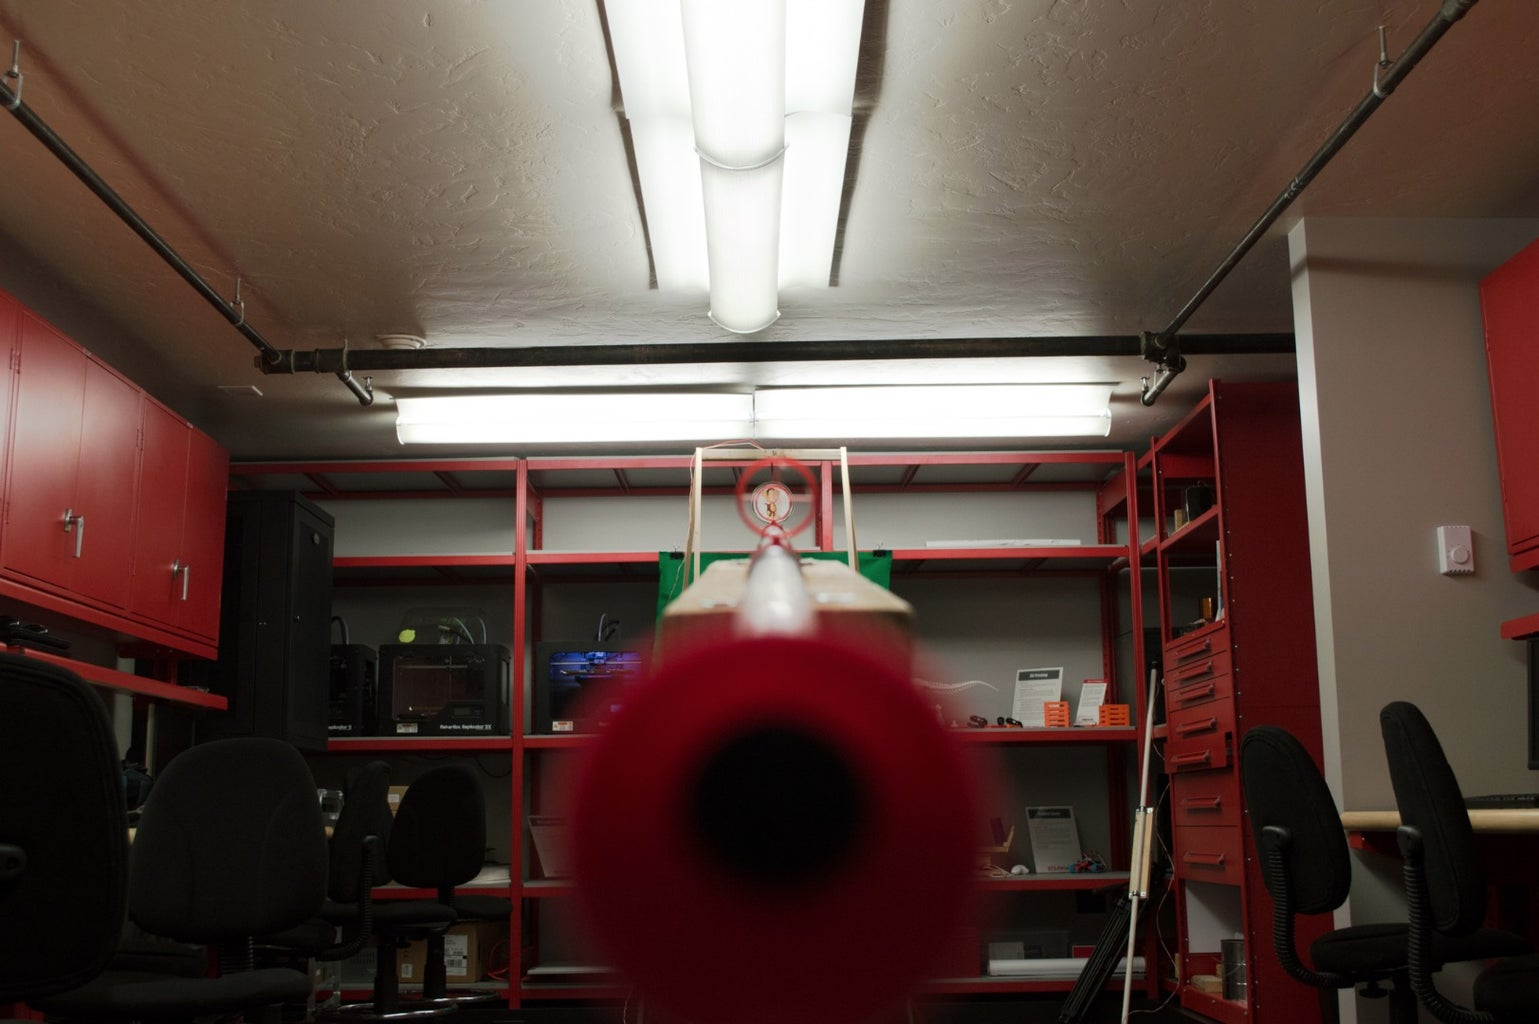 Monkey Hunter - Blow Guns, 3D Printing and Programming, Oh My!